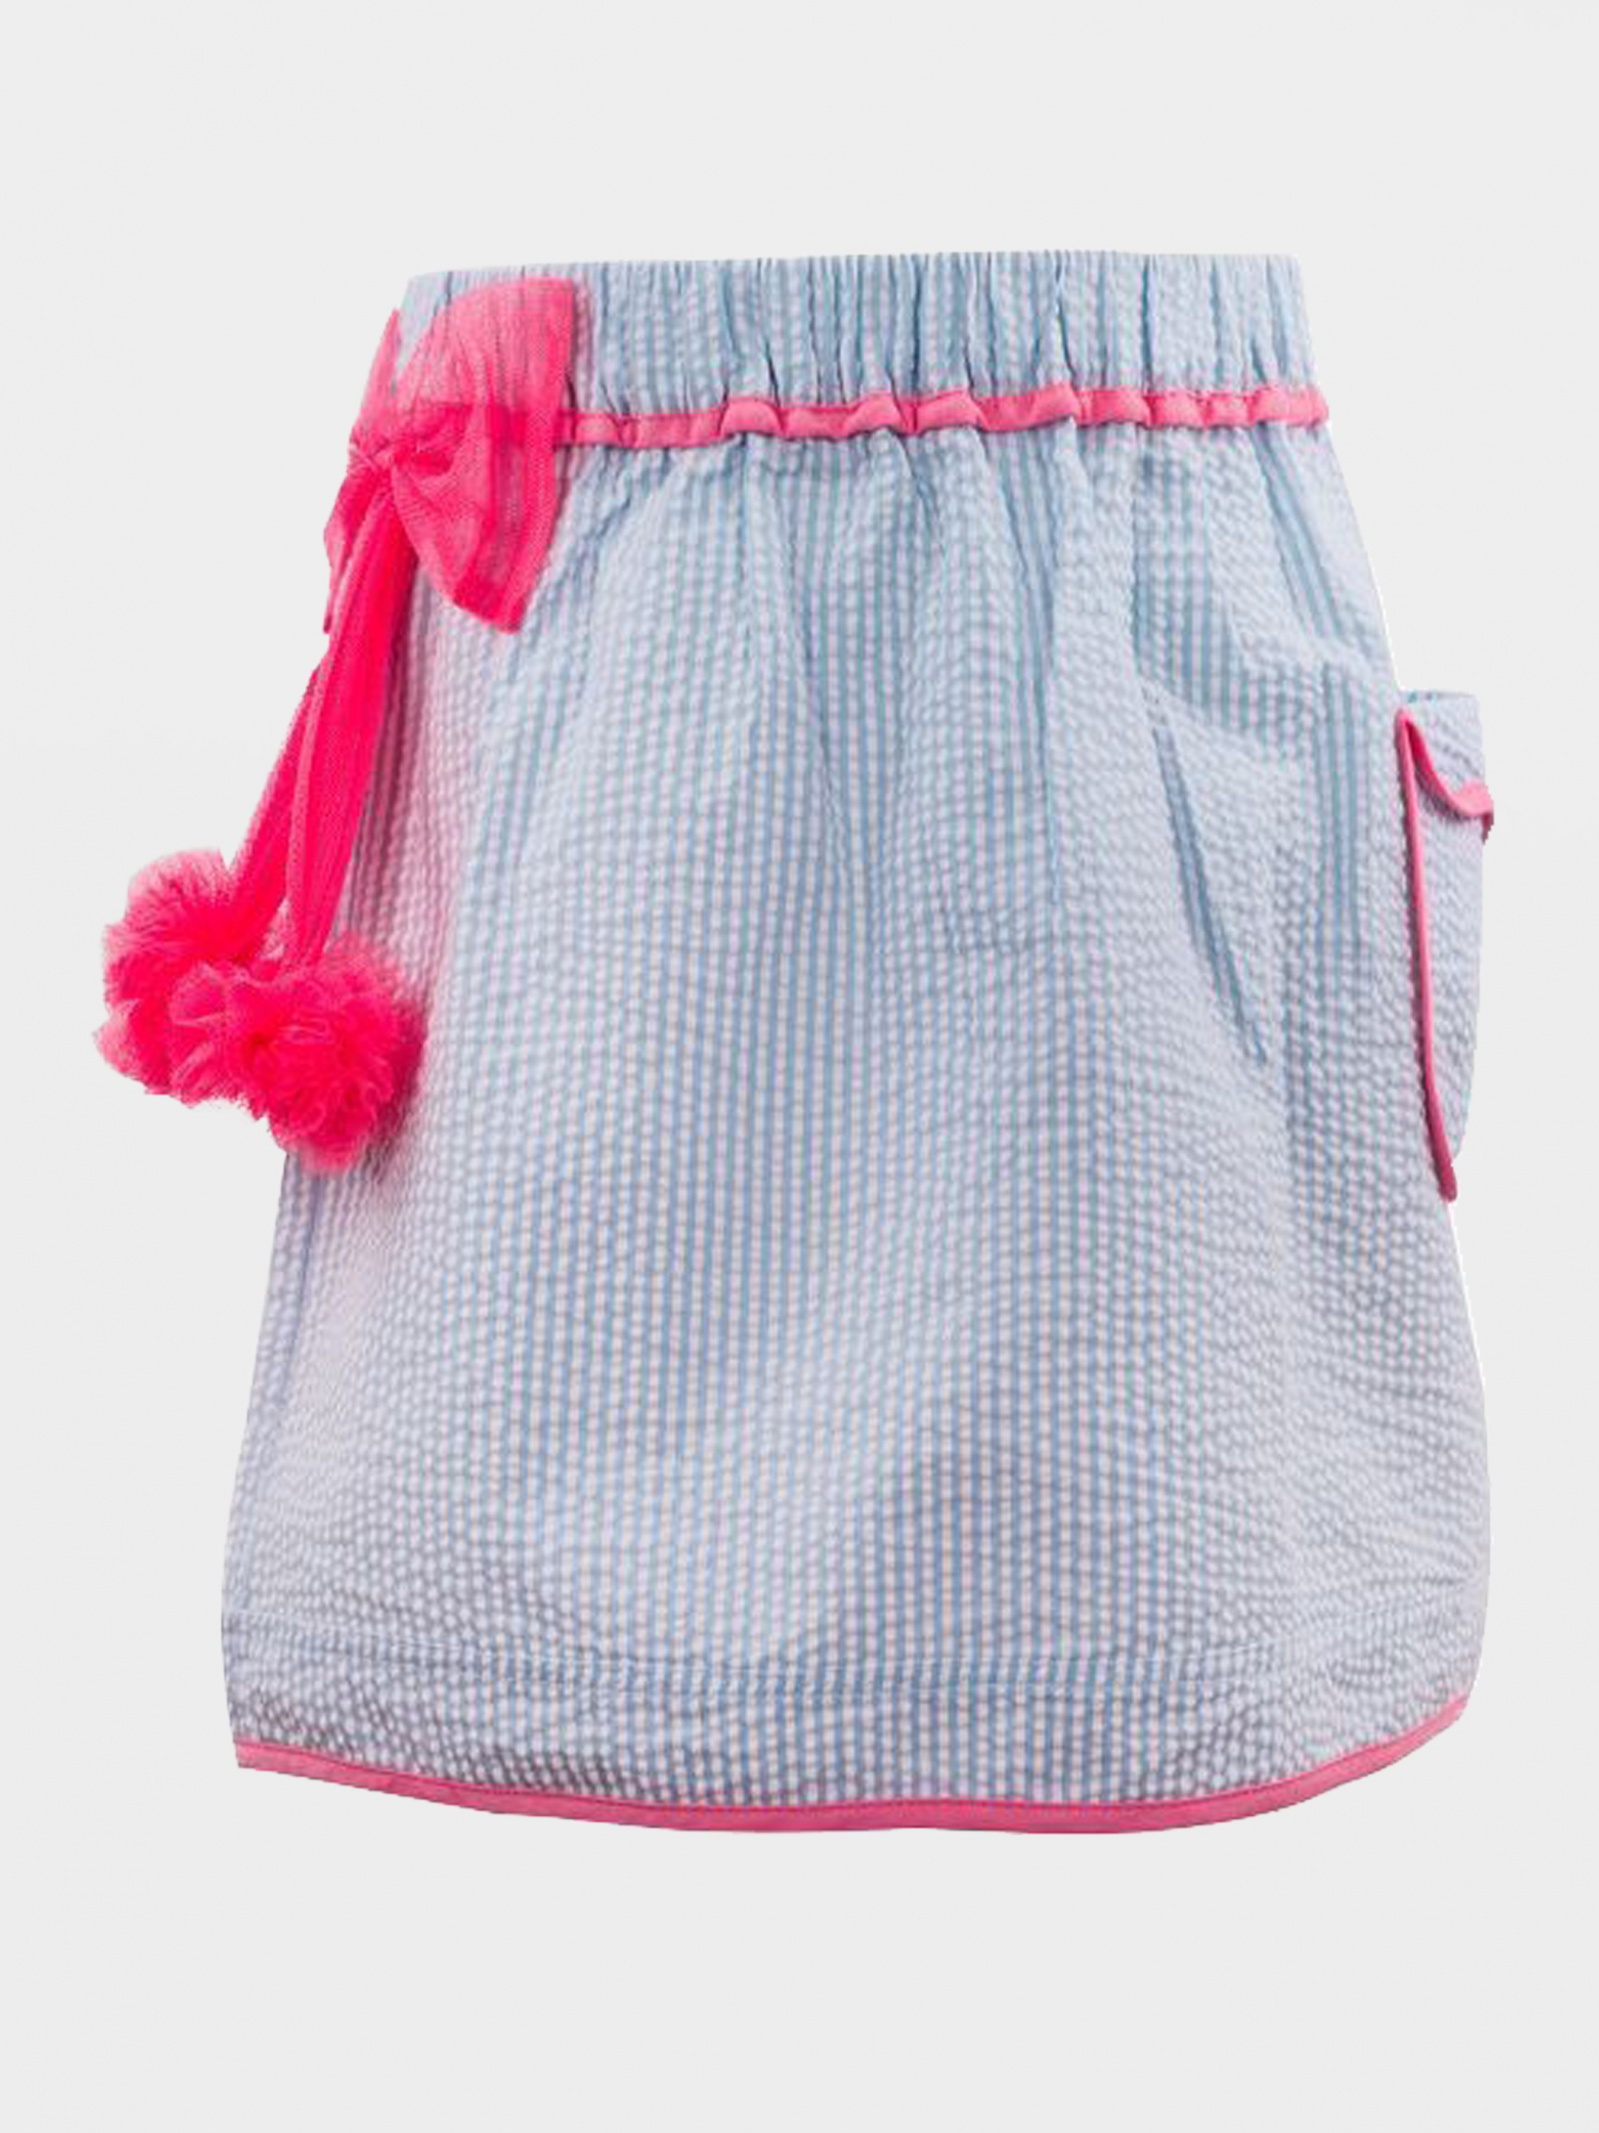 Юбка детские BILLIEBLUSH модель ID511 , 2017